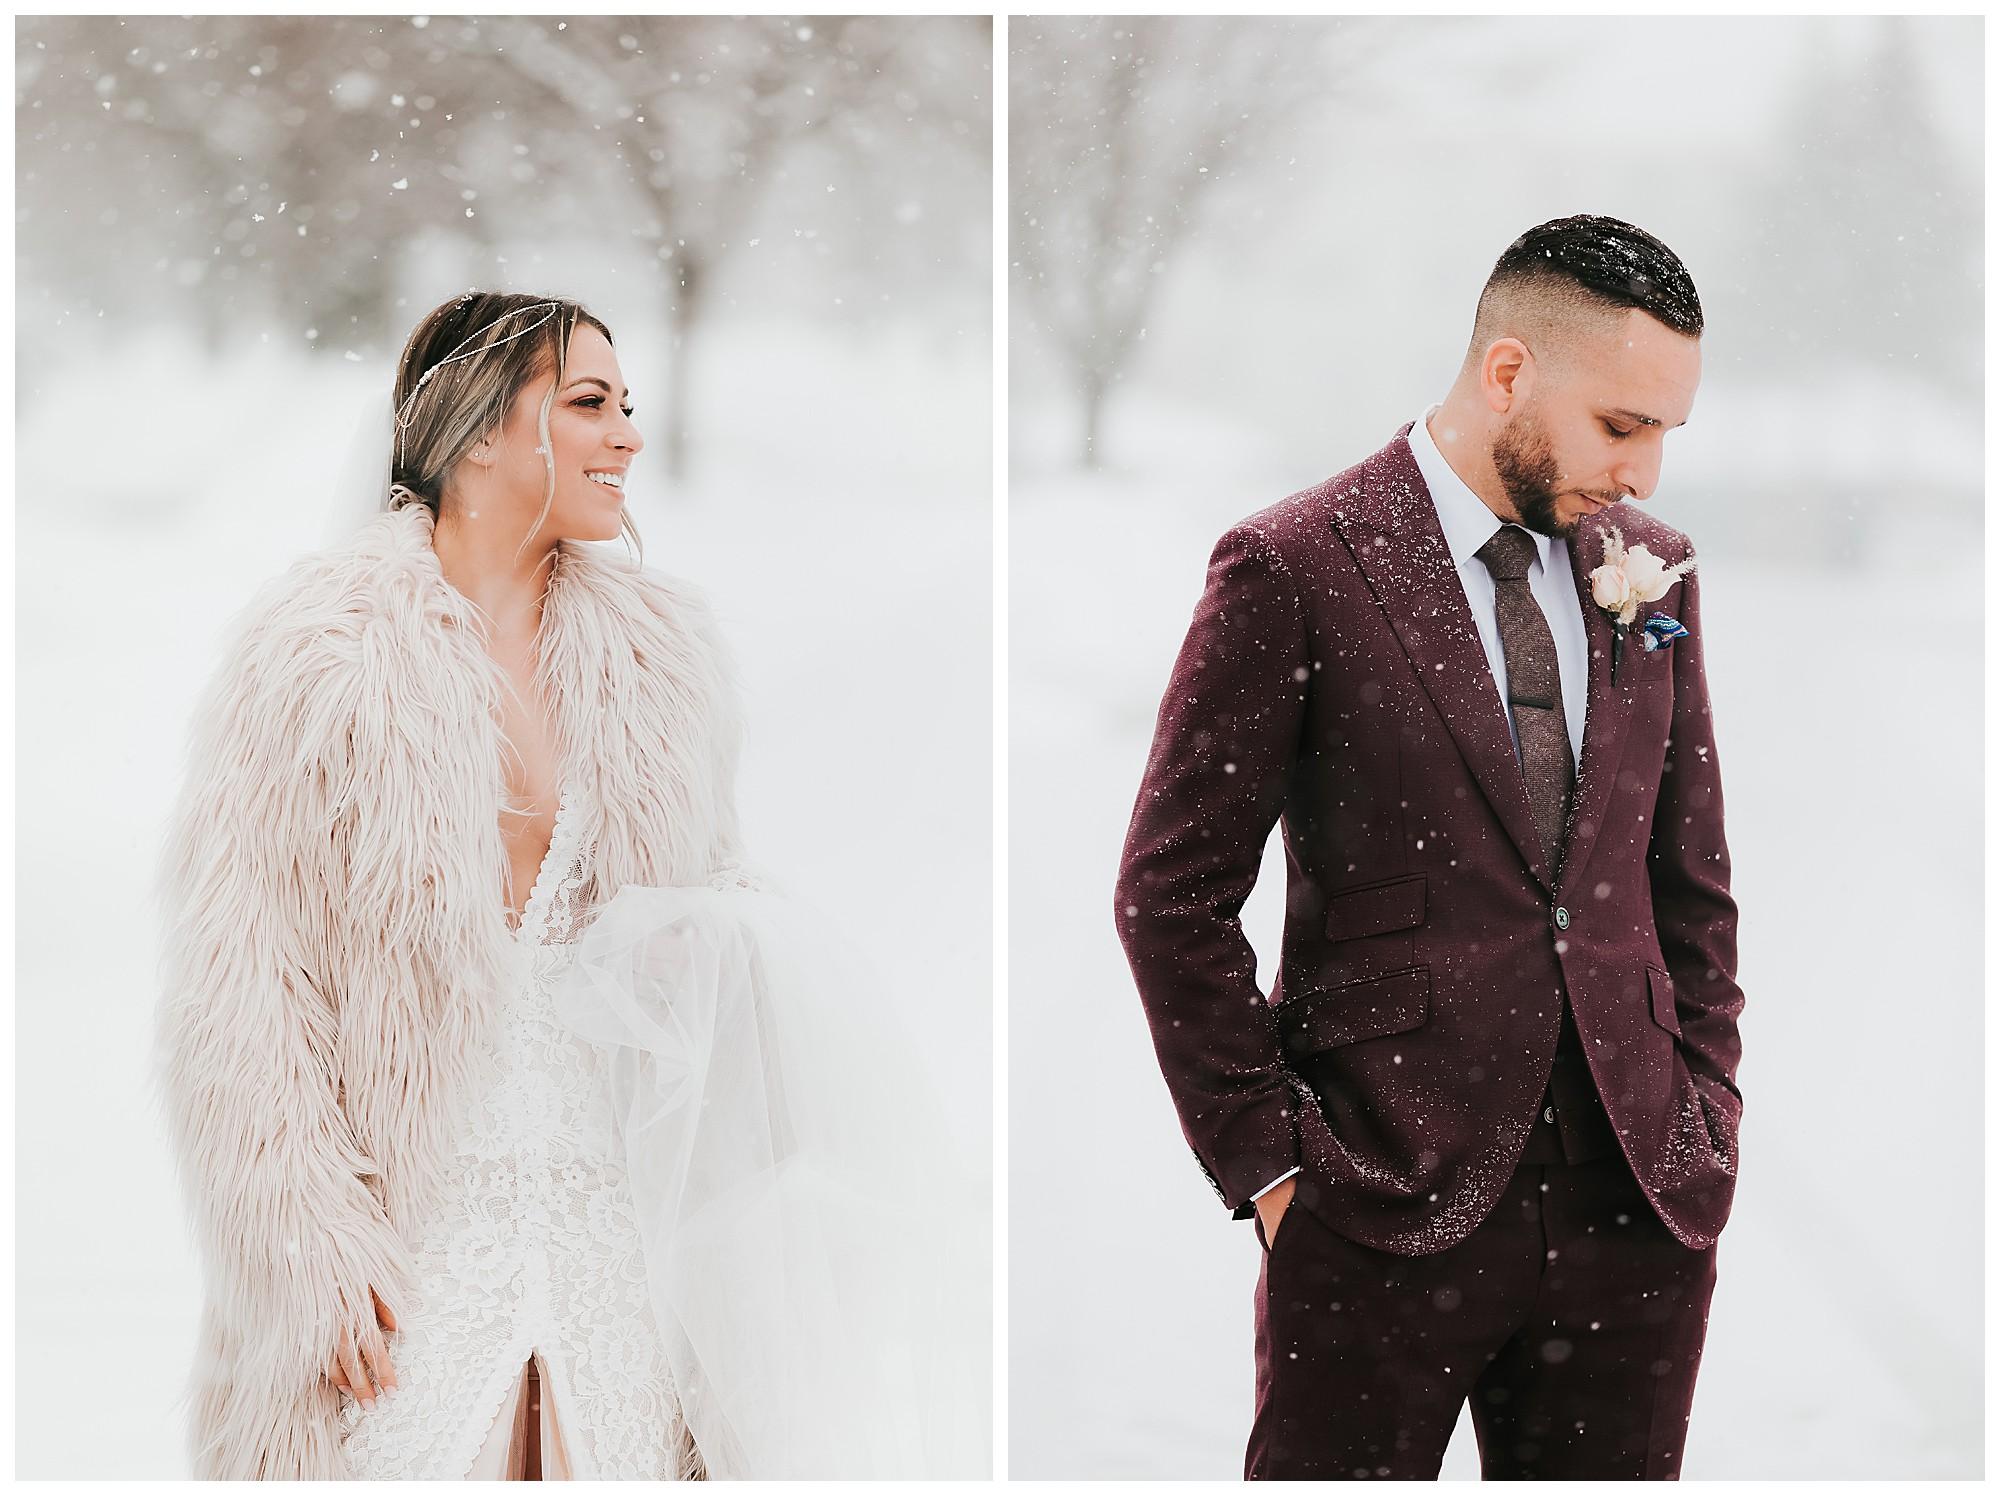 Joanna-Christos-Grand-Luxe-Wedding-Photos-Mint-Room-Toronto-VanDaele-Russell_0066.jpg